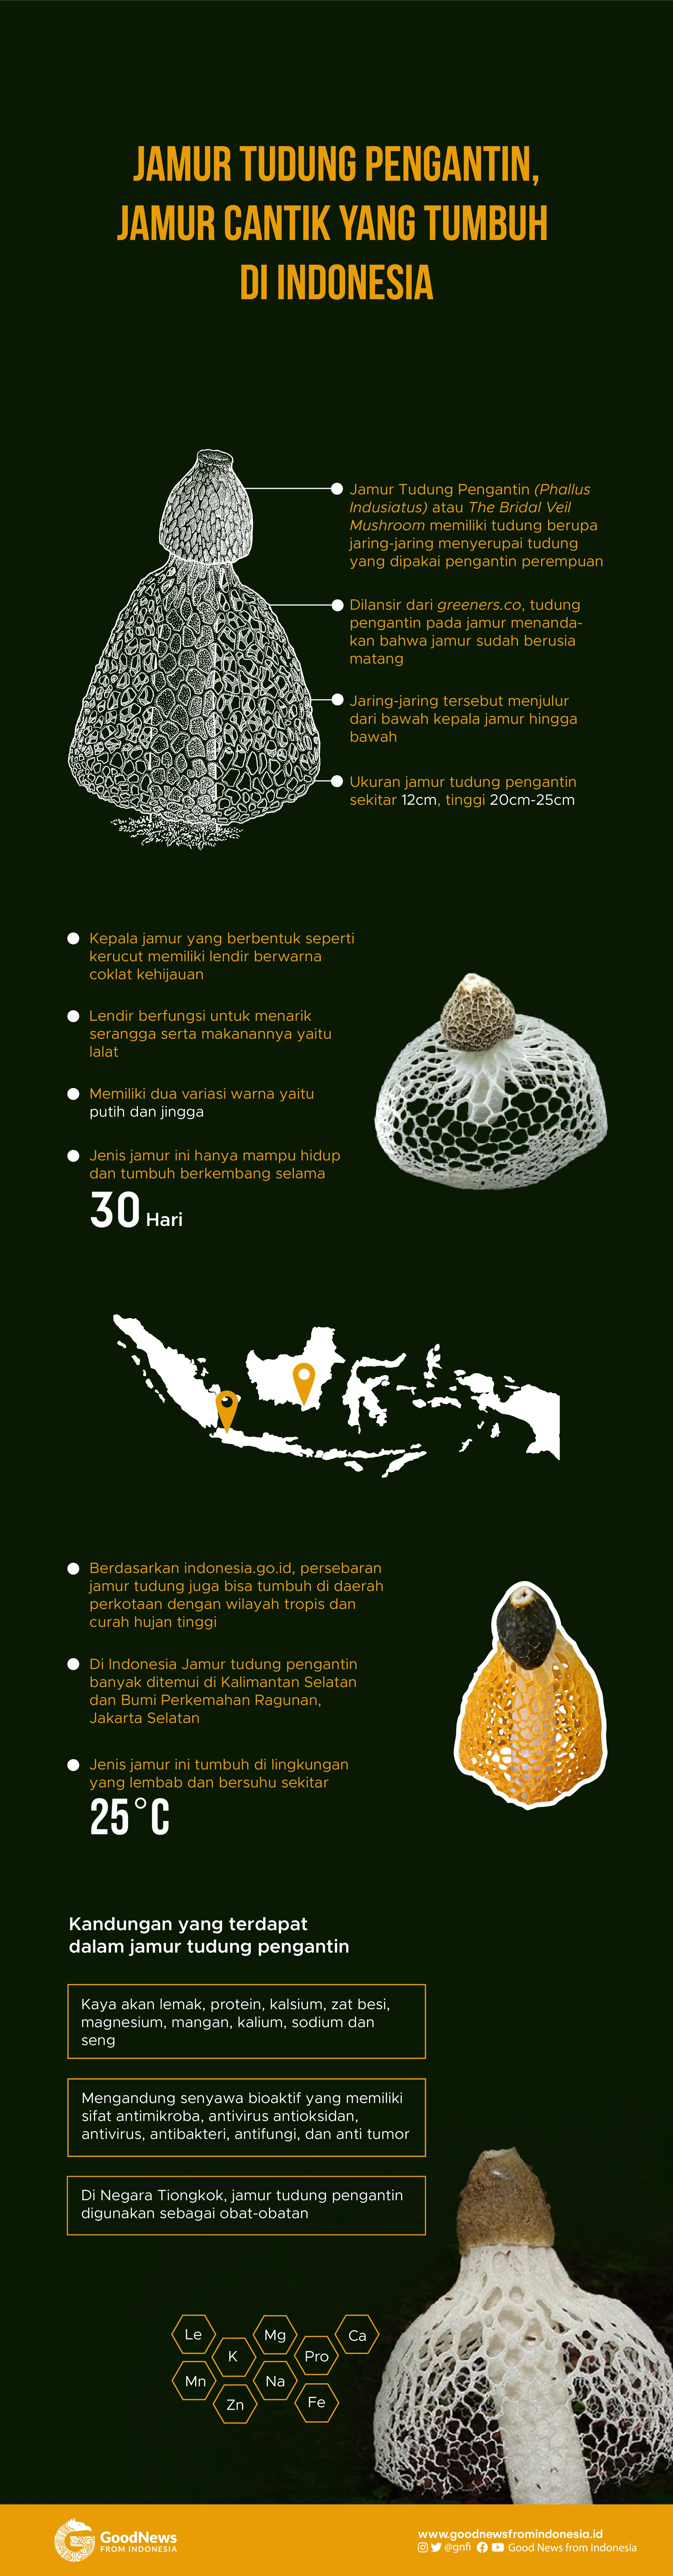 Mengenal Jamur Cantik yang Tumbuh di Indonesia